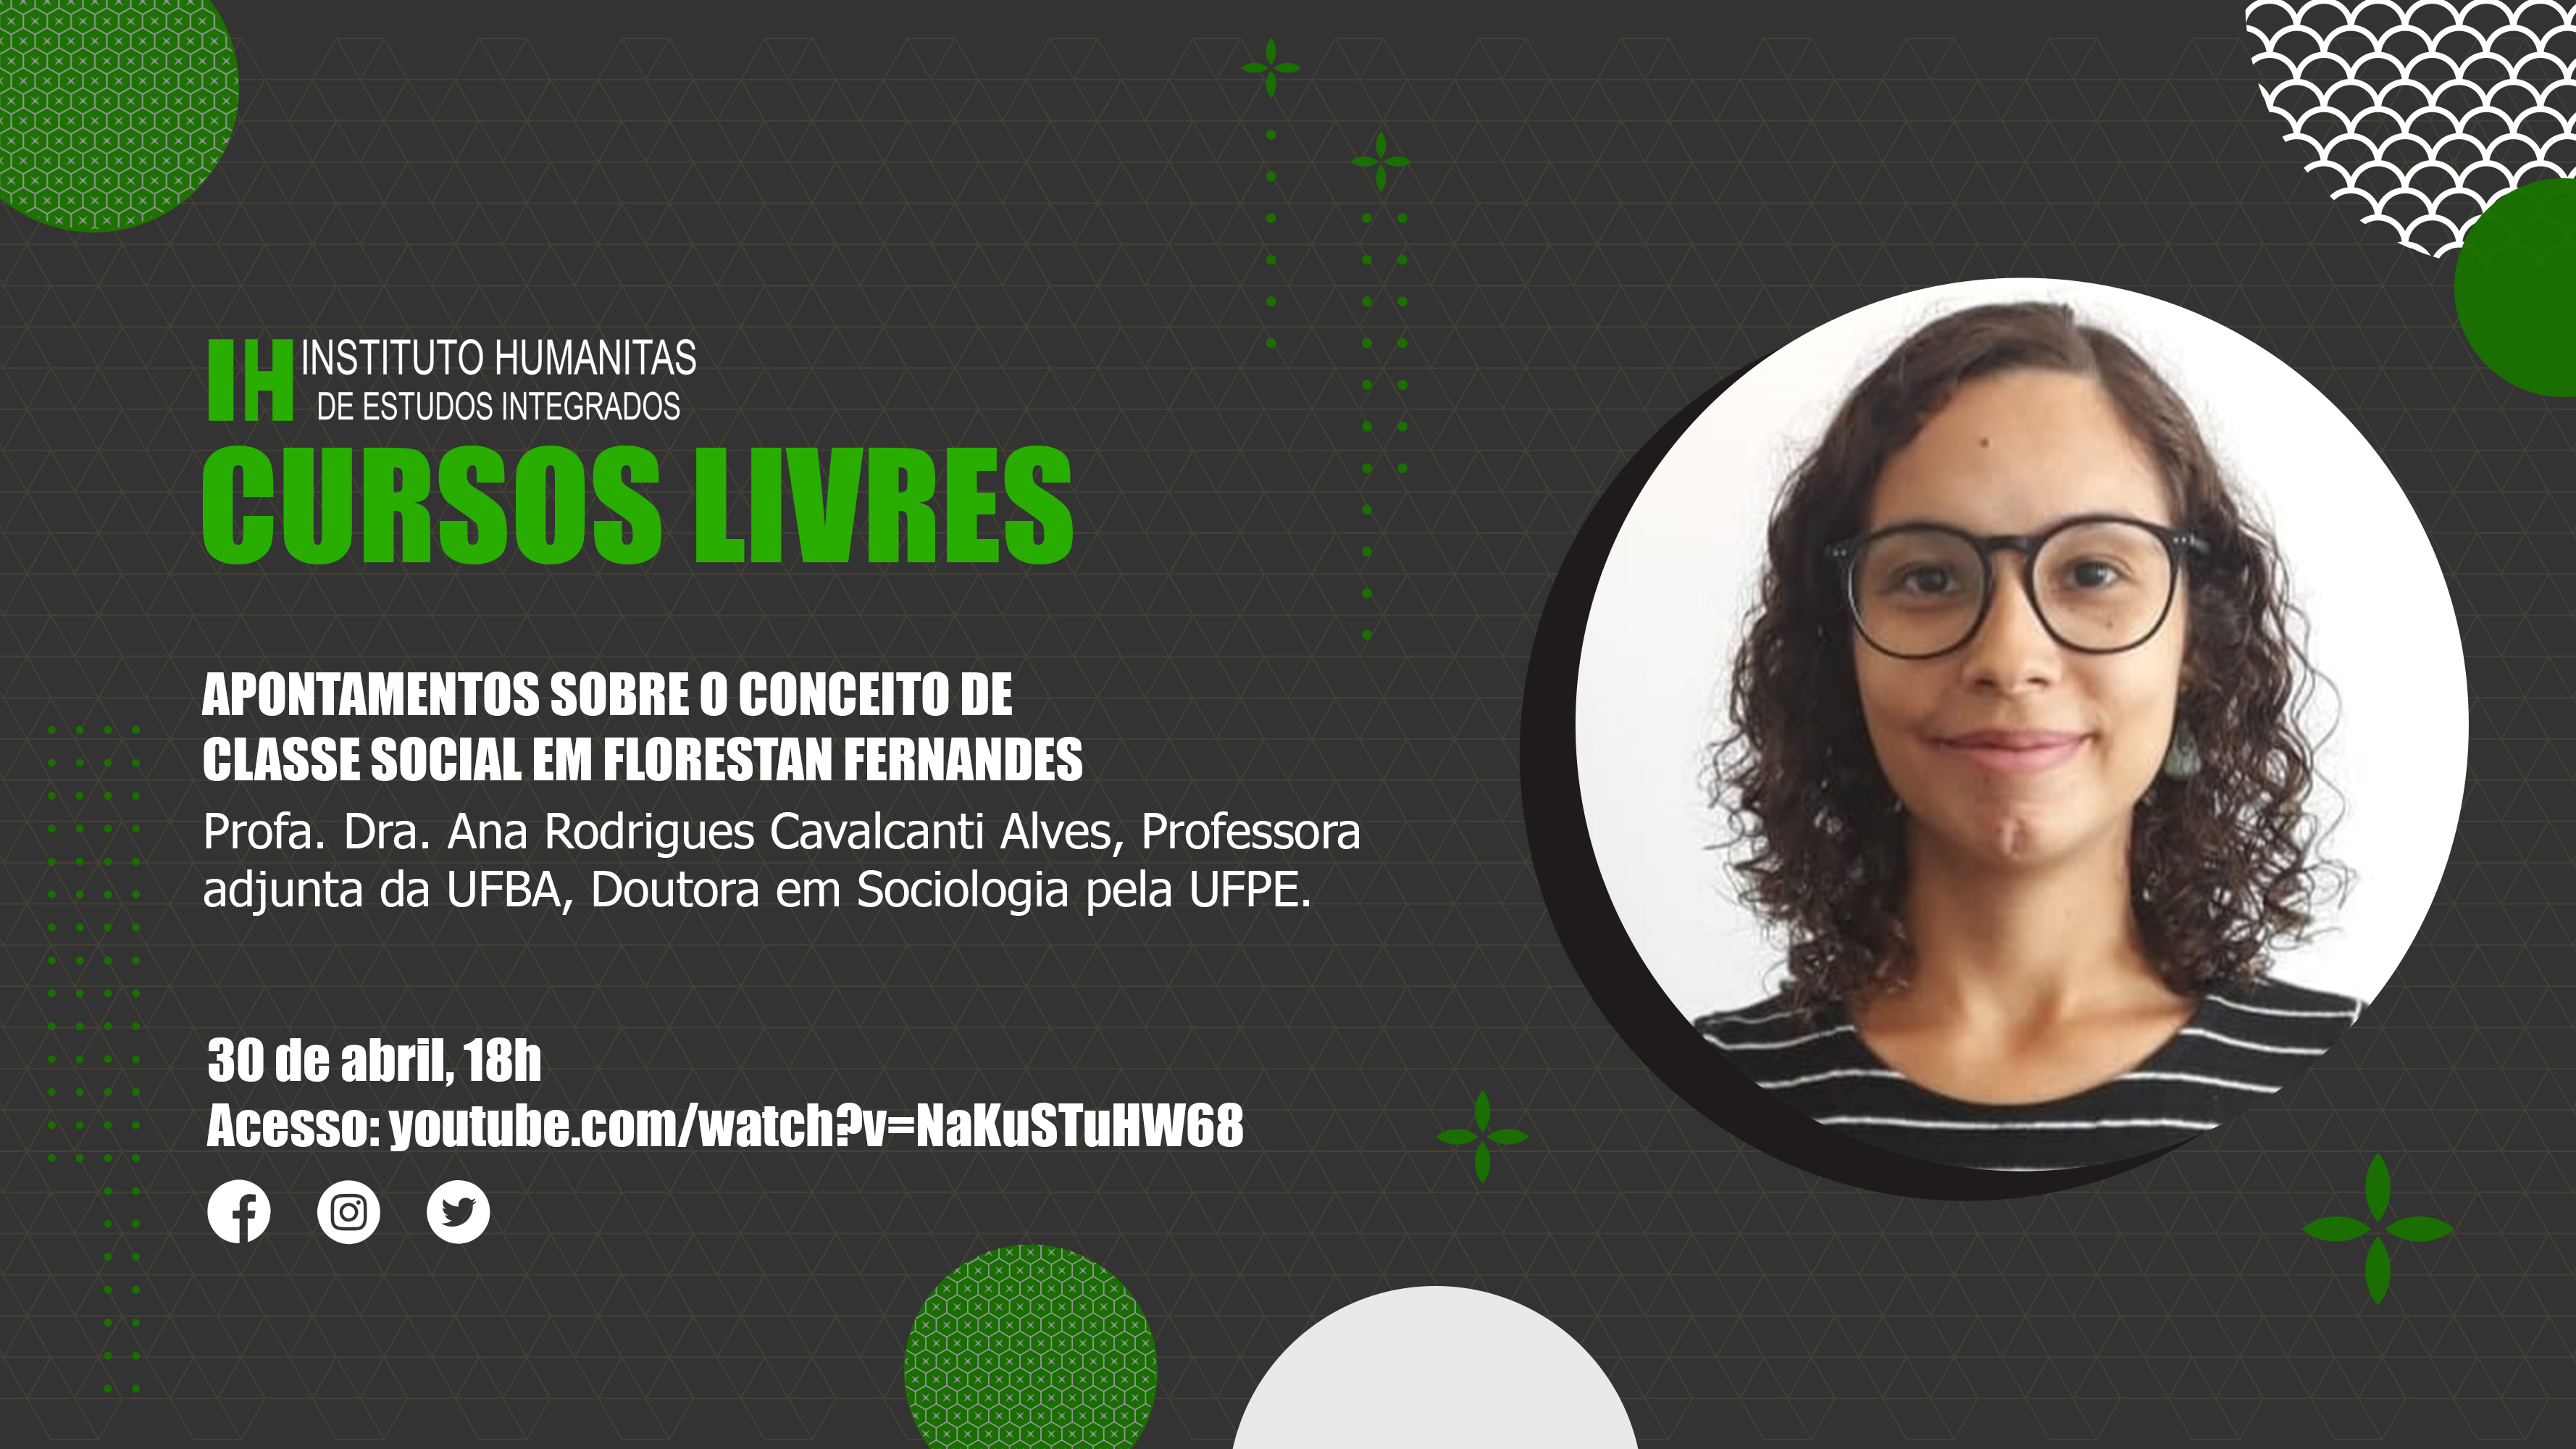 Cursos Livres - Conferência 03 (2021)